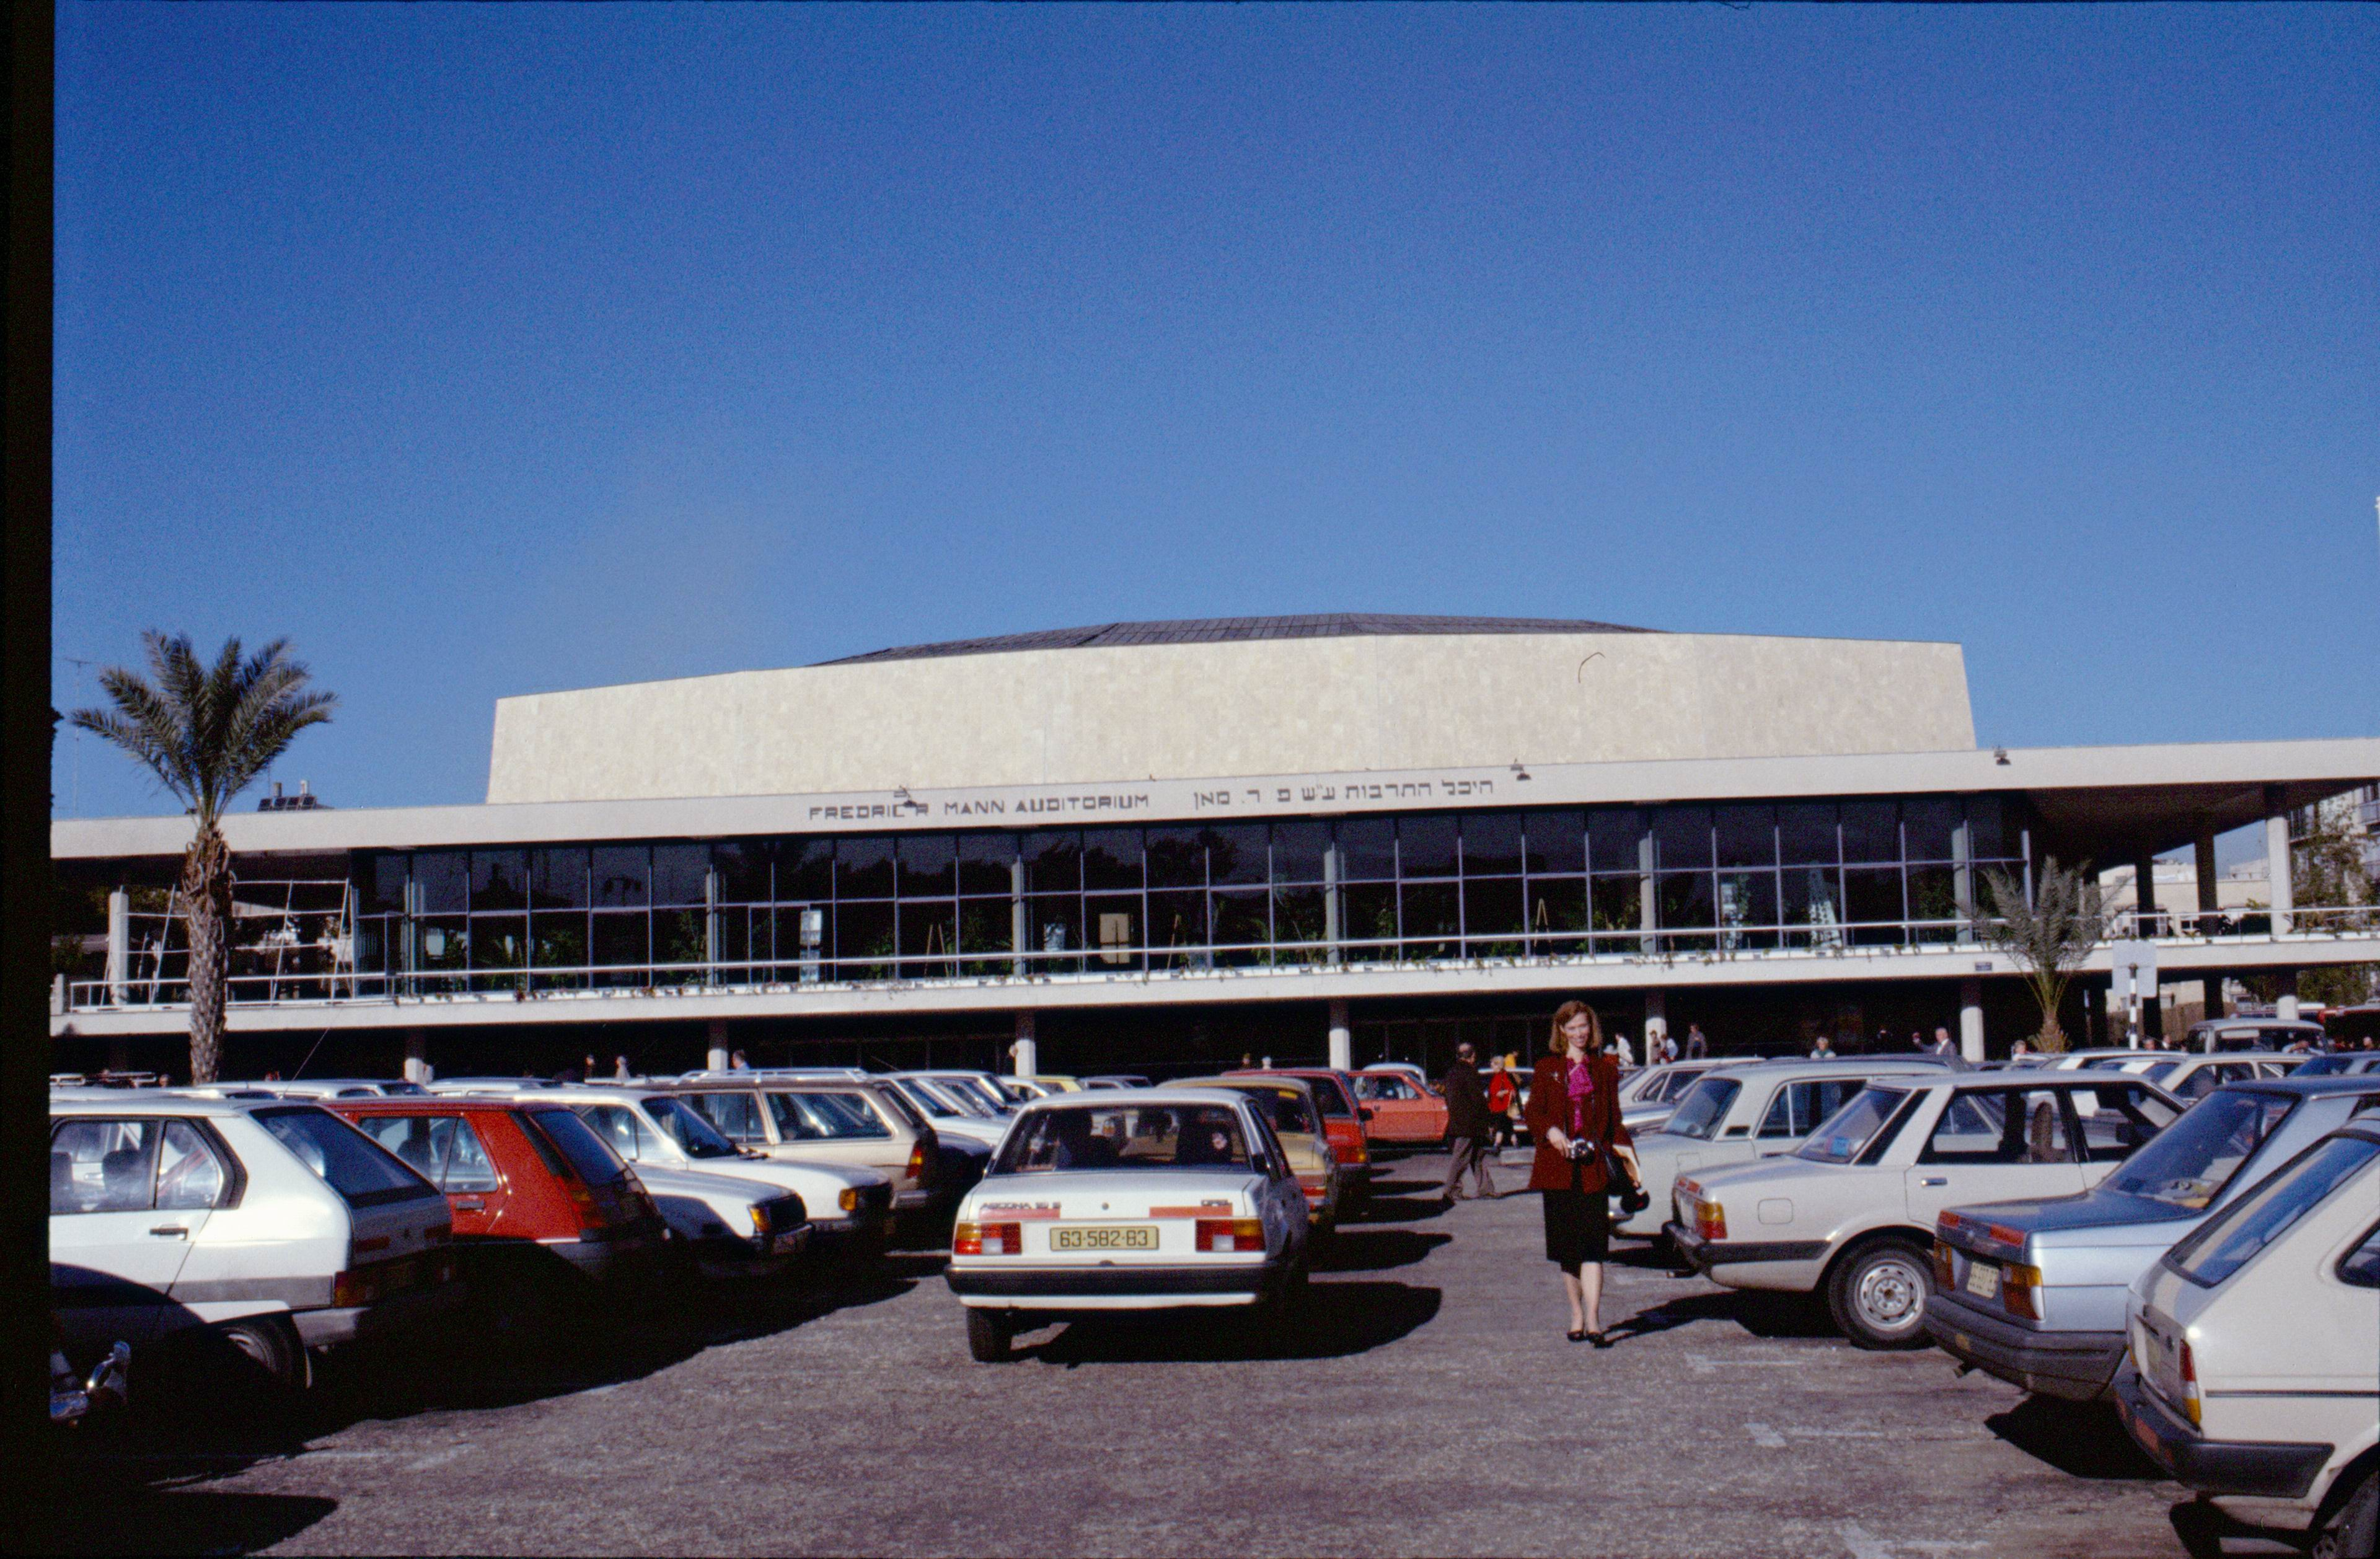 1986_12 (1) TEL-AVIV_ Auditorium F. Mann (1)